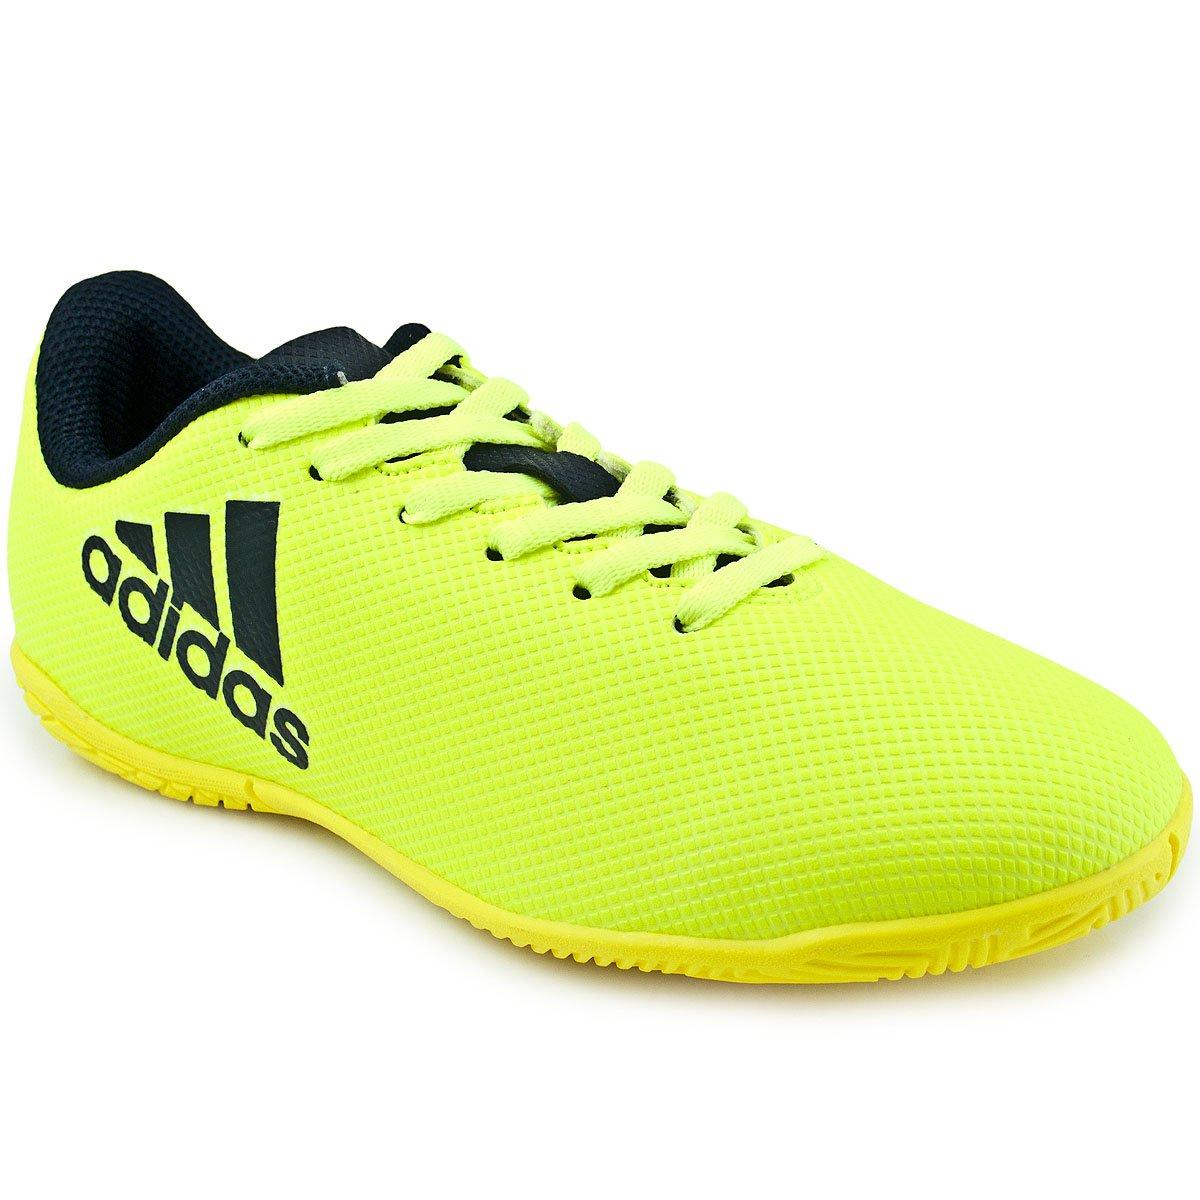 2a5095e4f2 Chuteira Adidas X 17.4 IN Jr